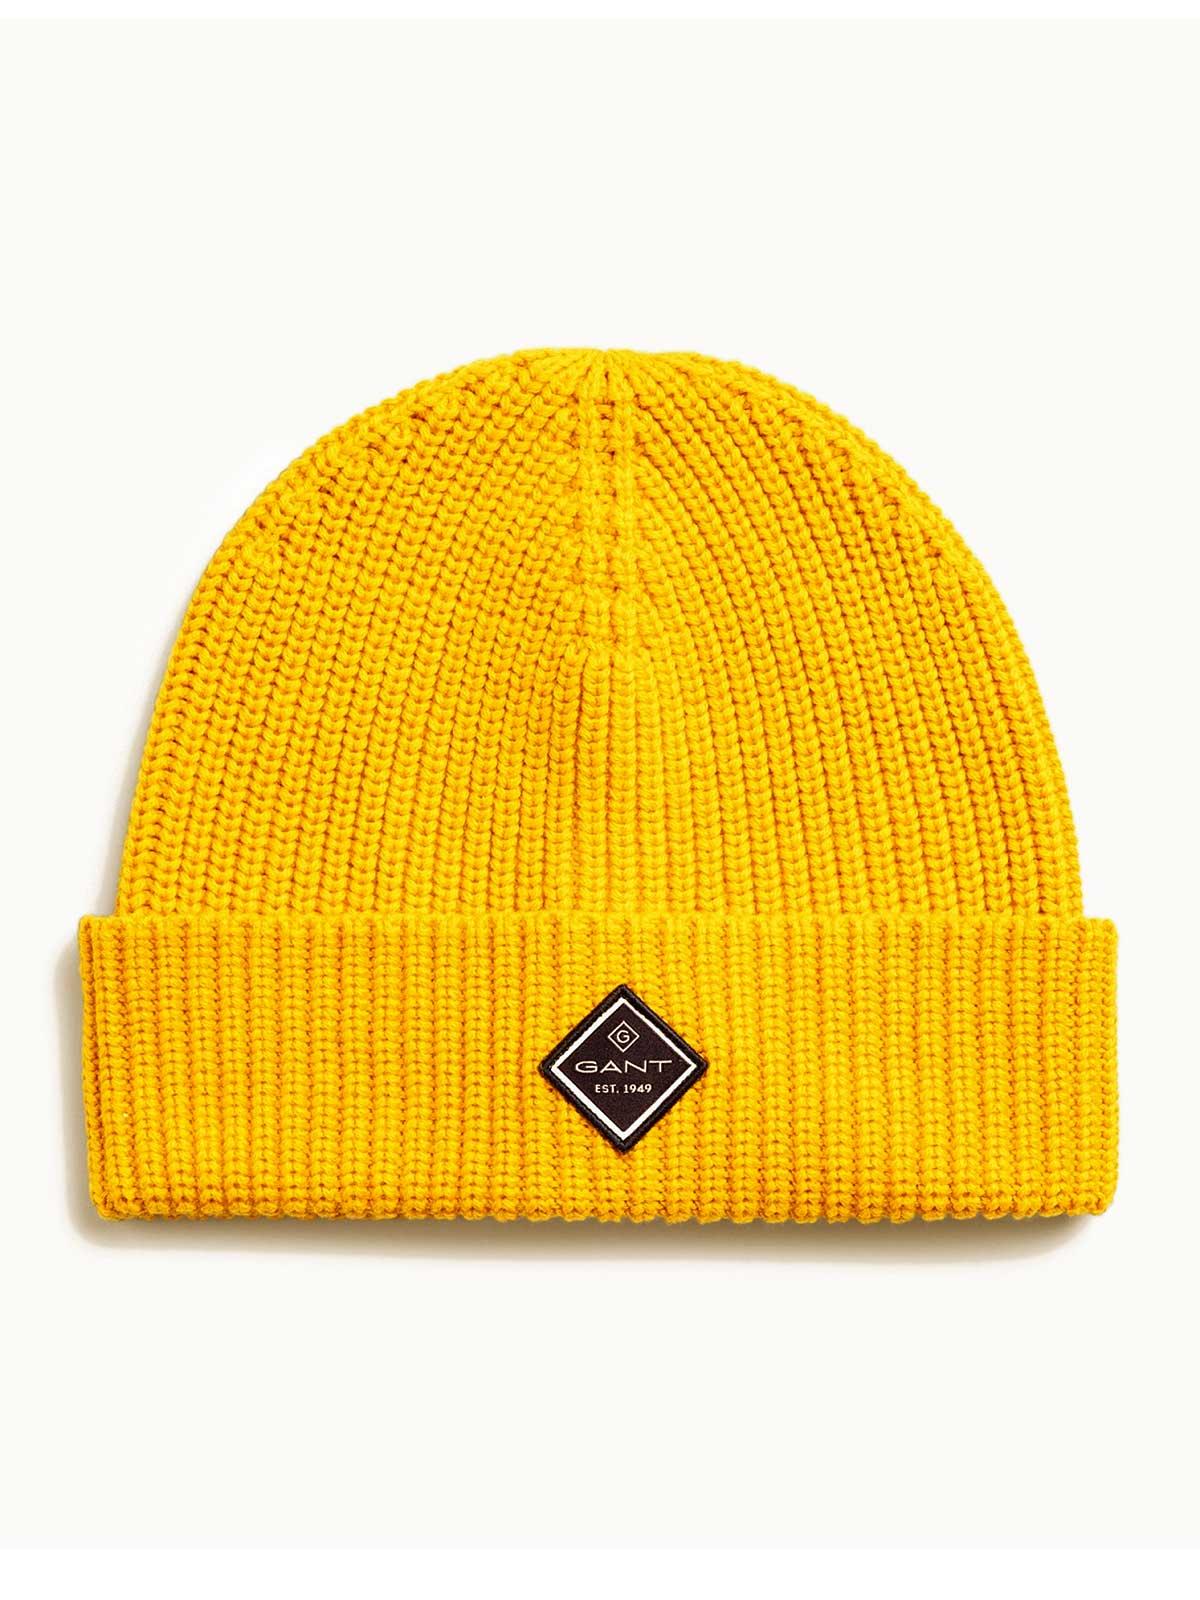 Picture of GANT | Men's Cotton Rib Knit Hat